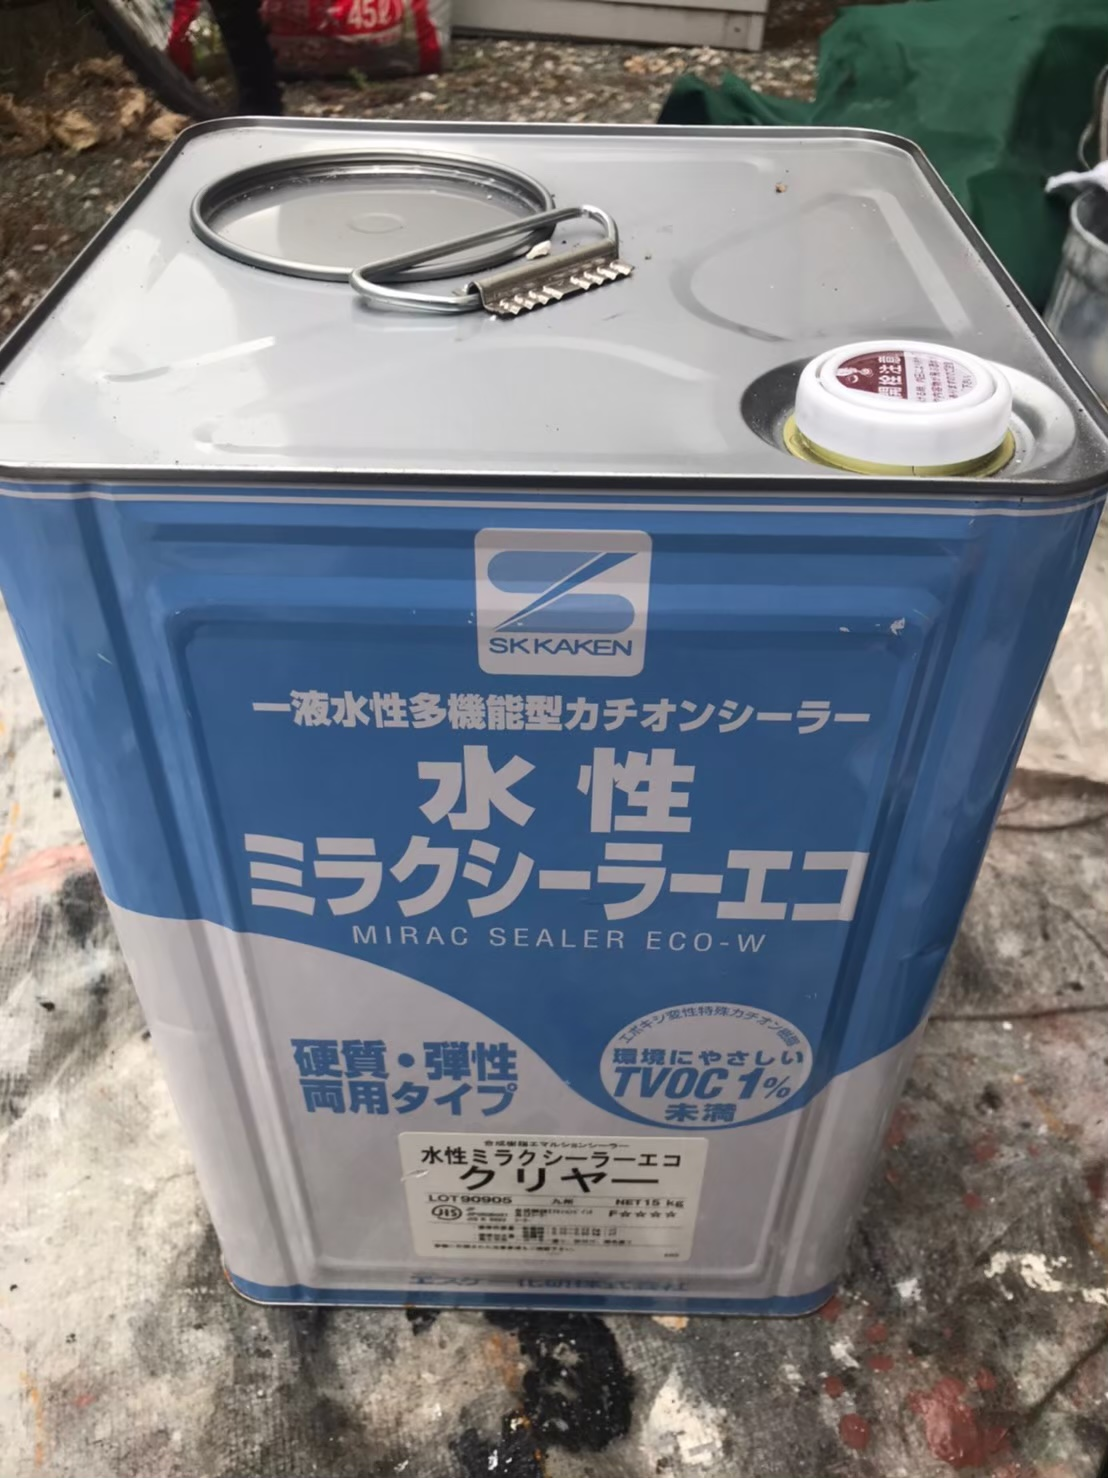 SK化研・ミラクシーラーエコ